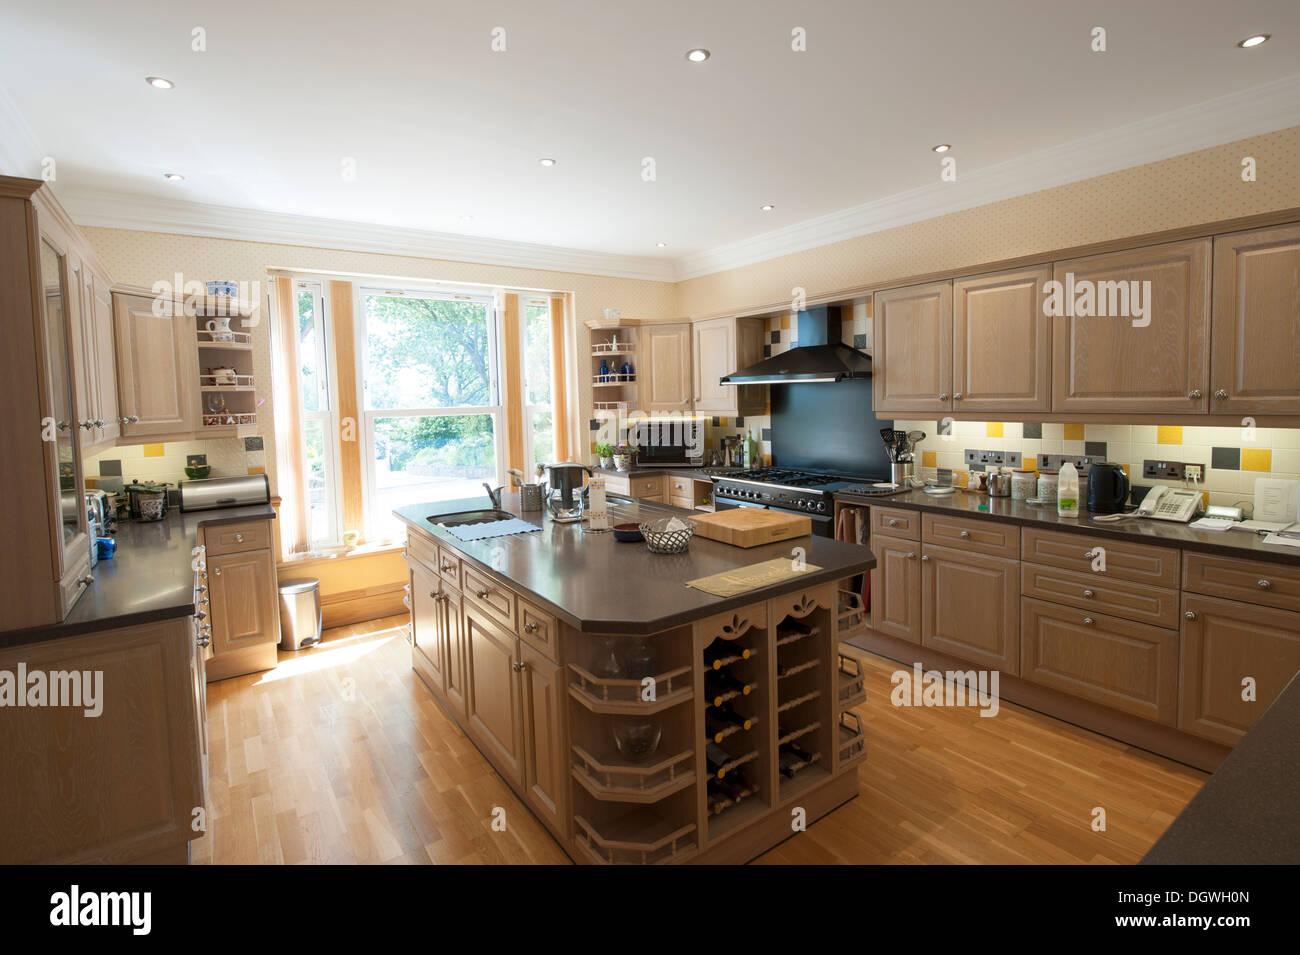 modern geopic stockfotos modern geopic bilder alamy. Black Bedroom Furniture Sets. Home Design Ideas